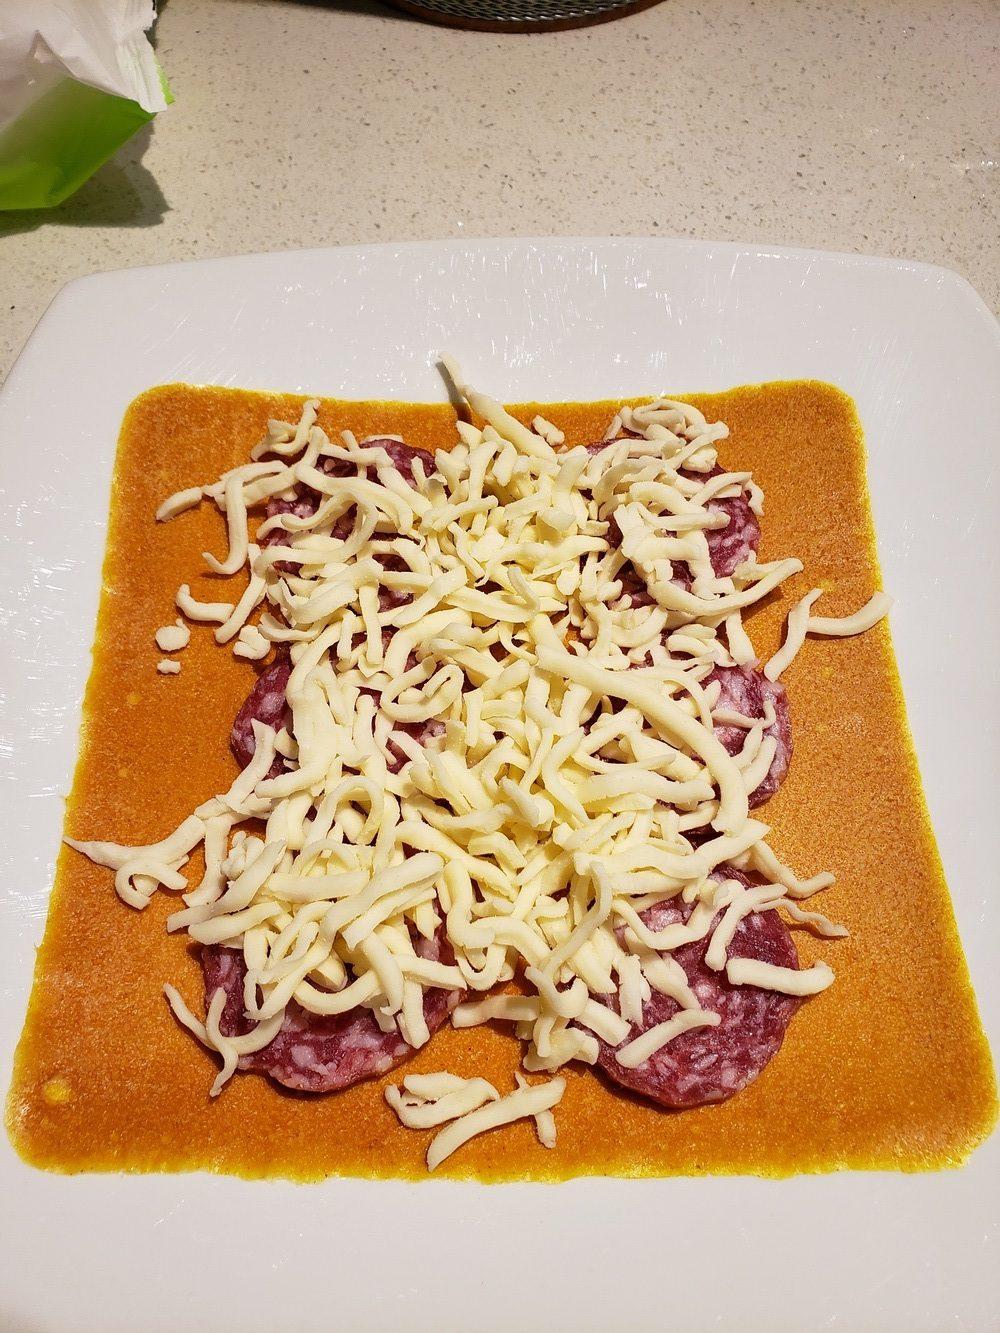 Dry Sausage and Mozzarella Keto Taco